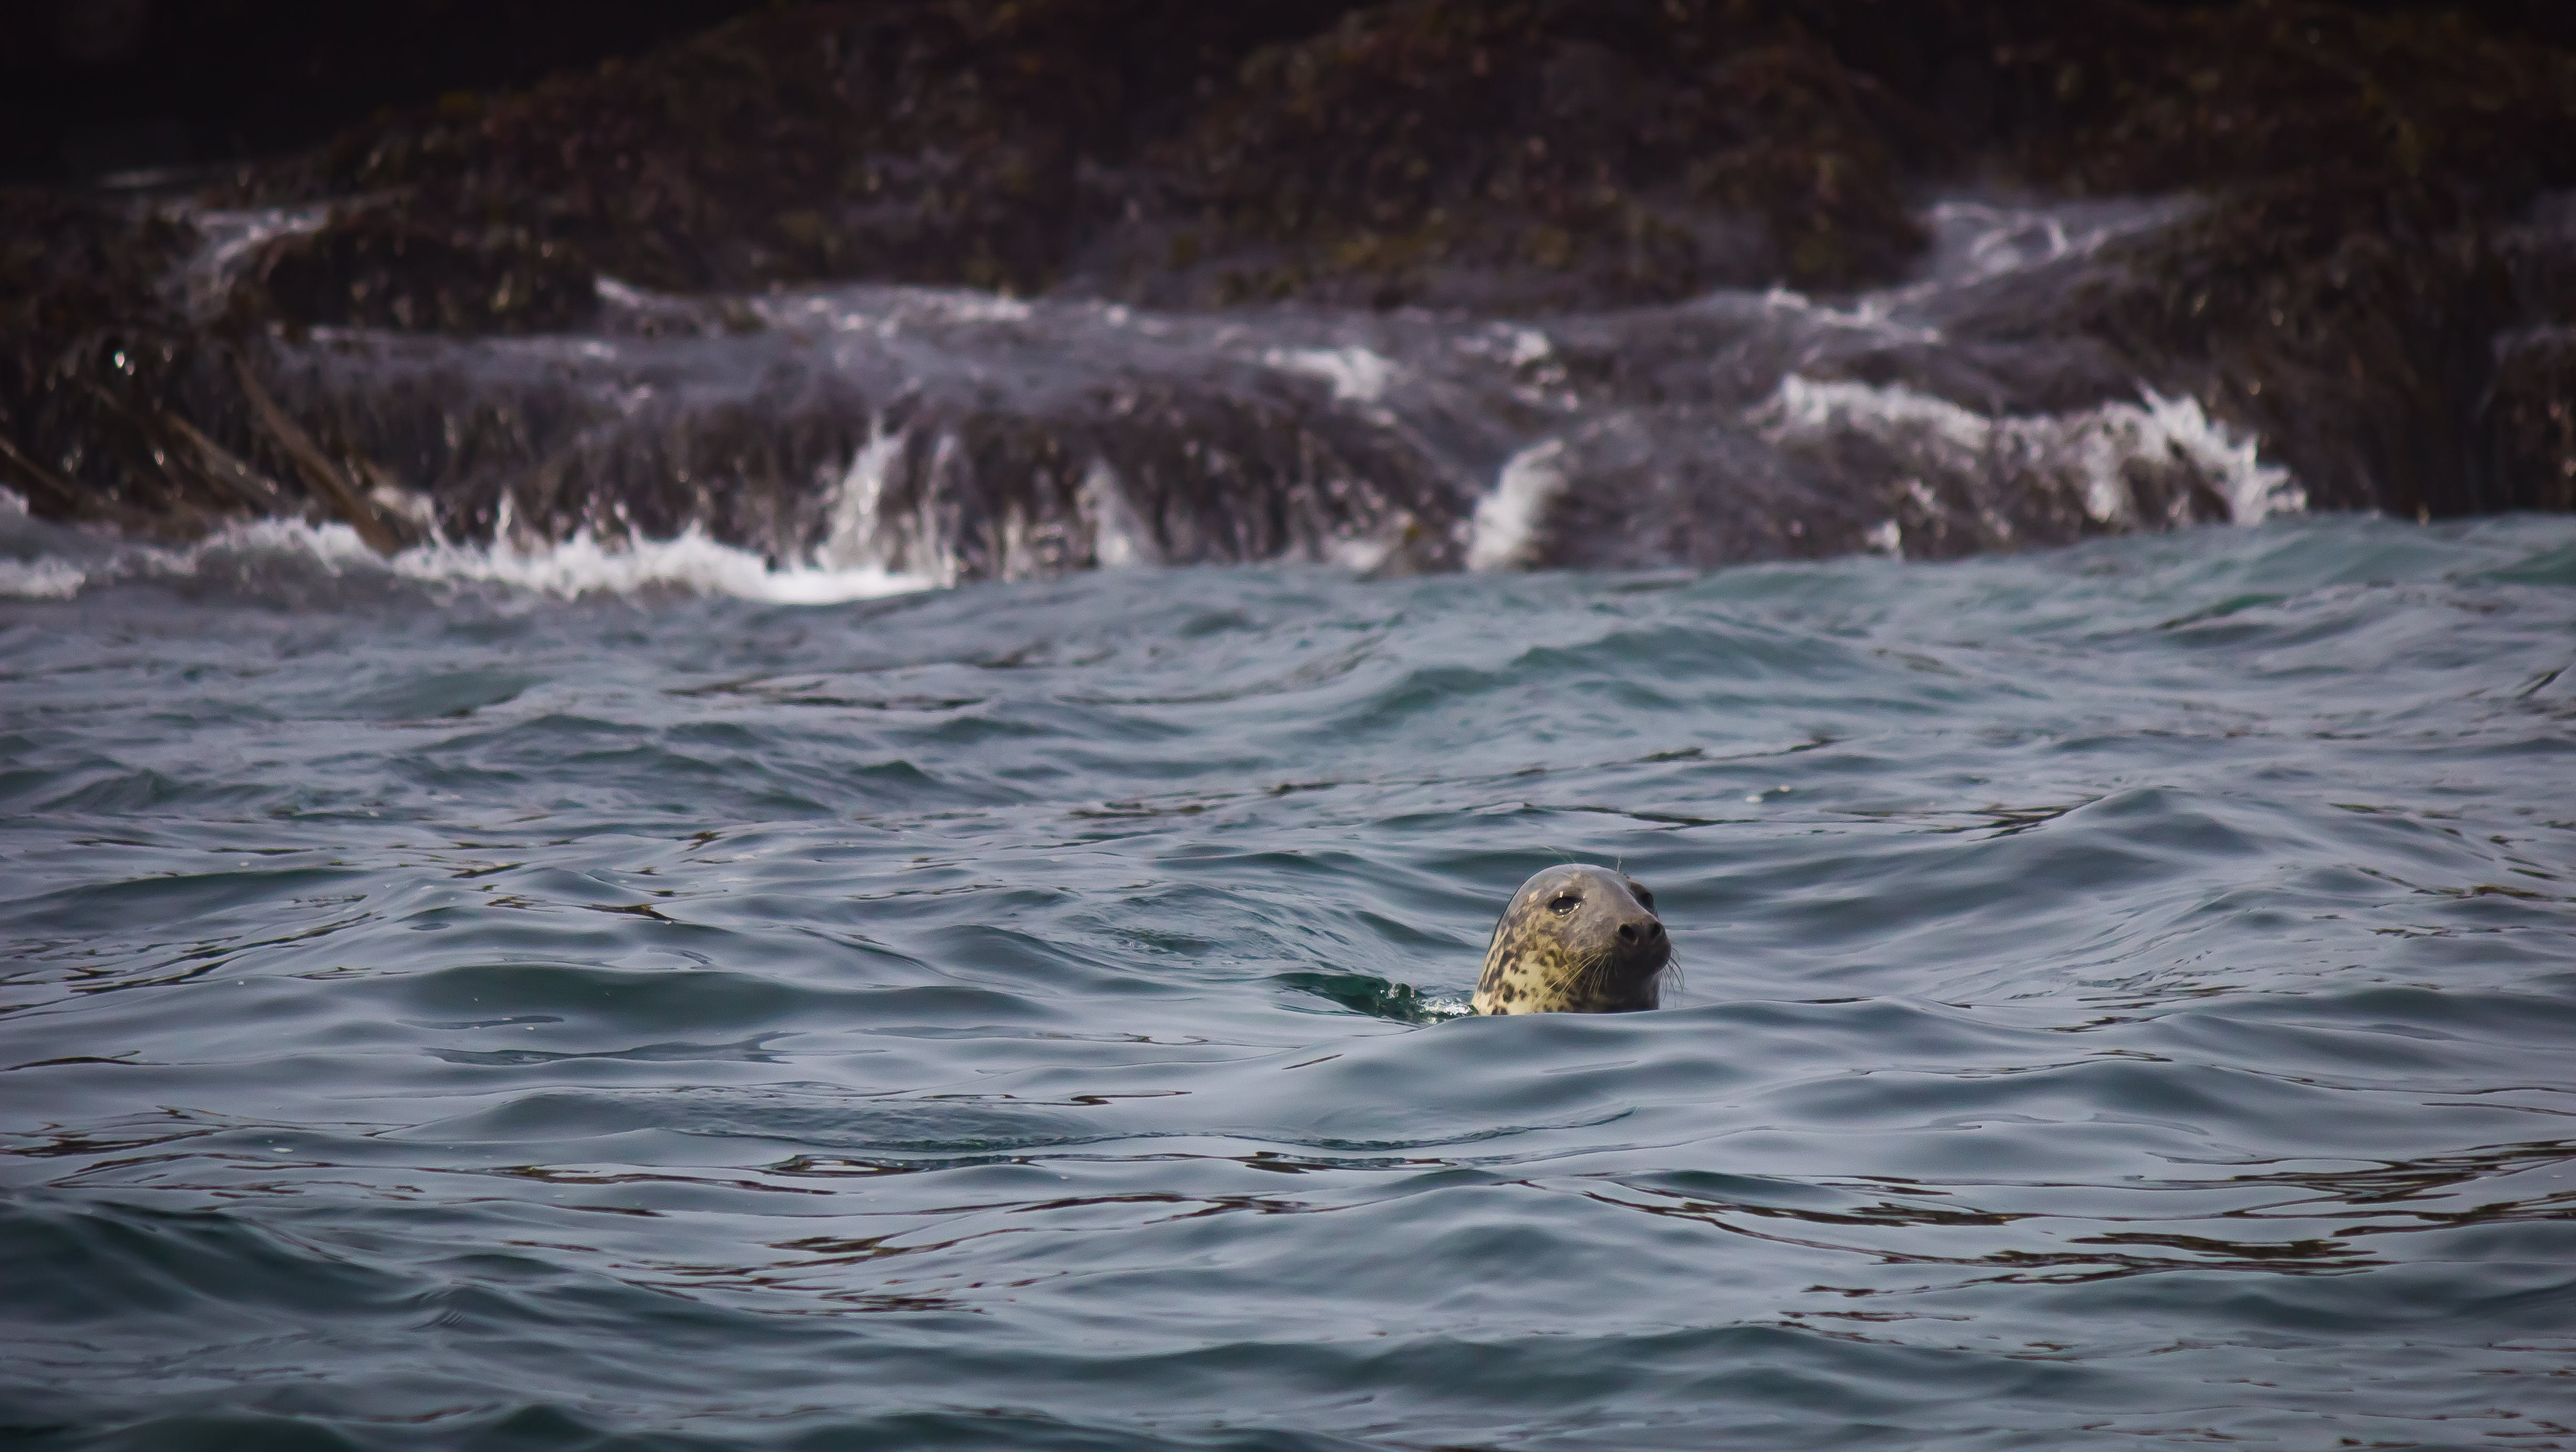 Brown Seal Swimming